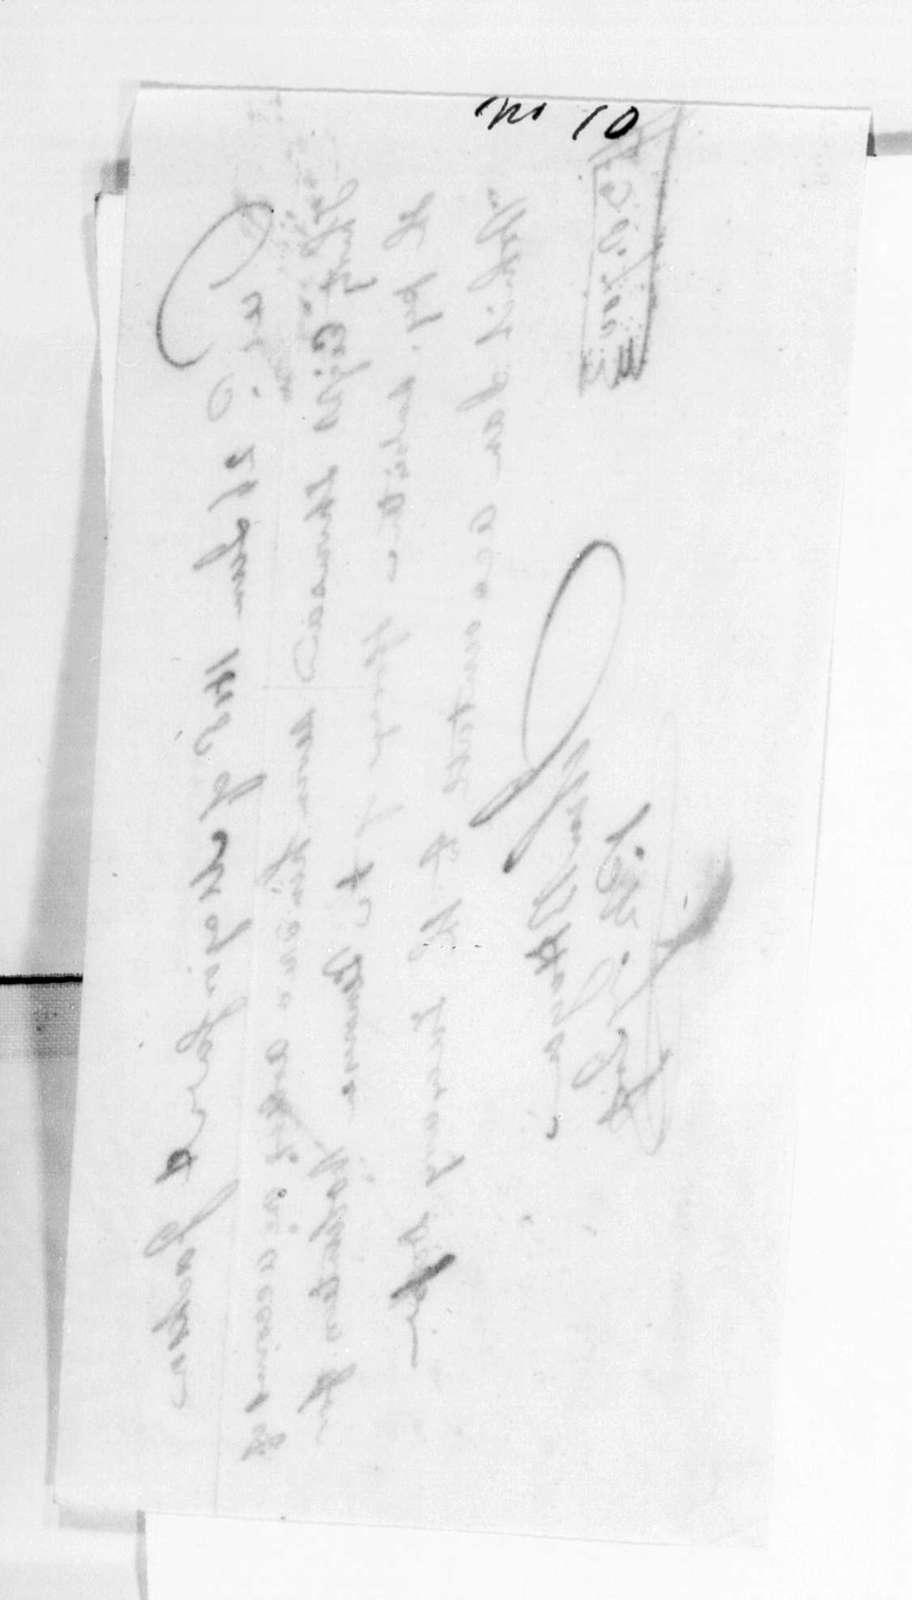 Military Papers - December 18, 1816 - June 30, 1818, Vol. X